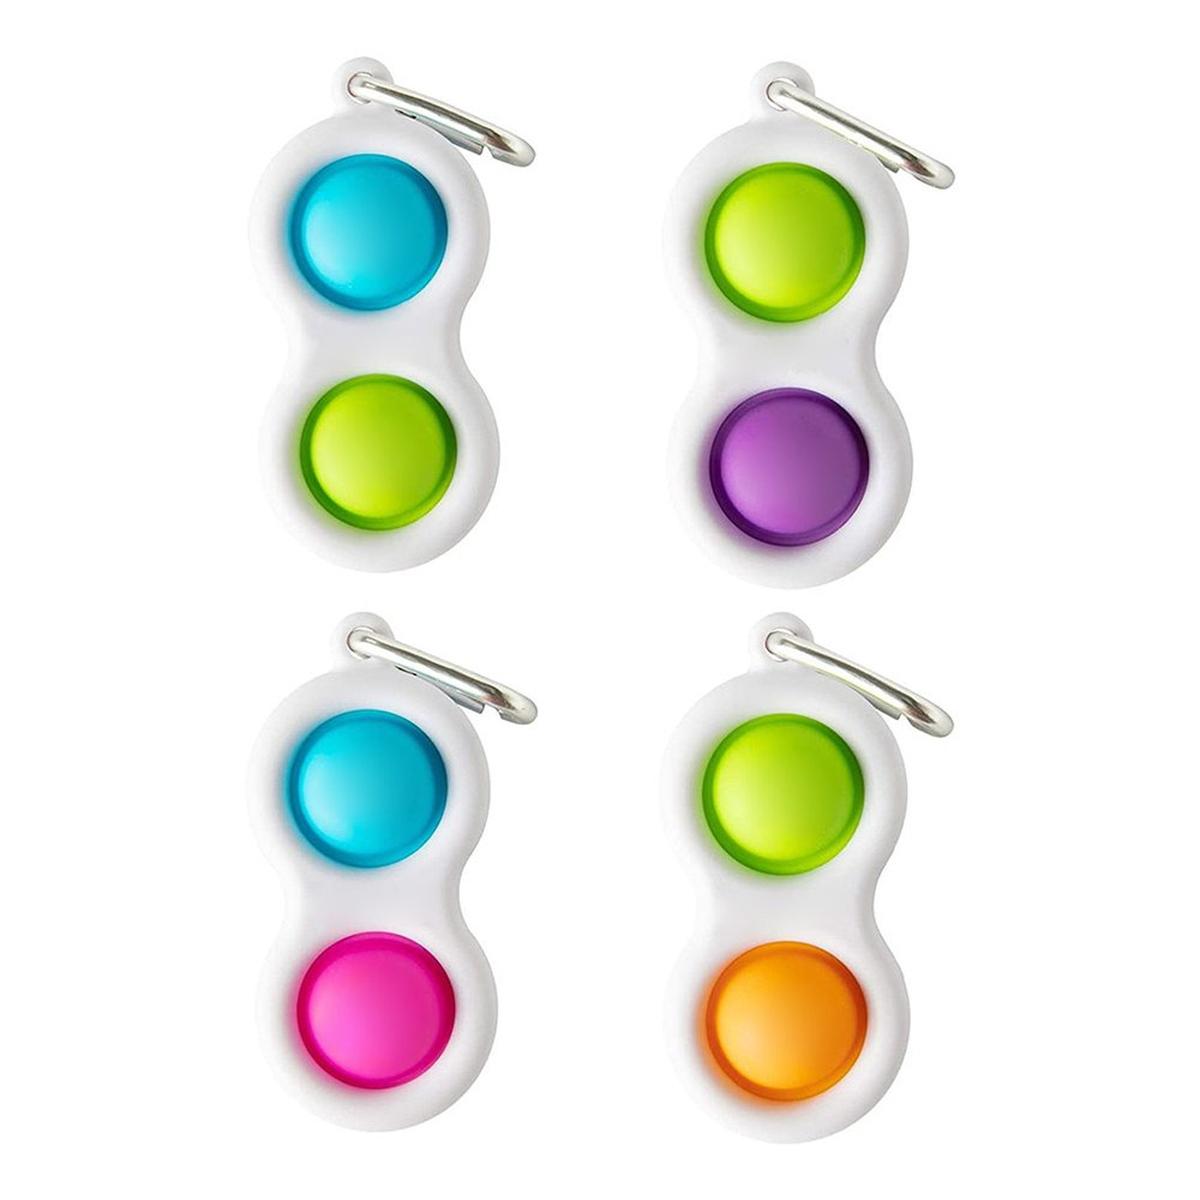 Simple Dimple Fidget Toys